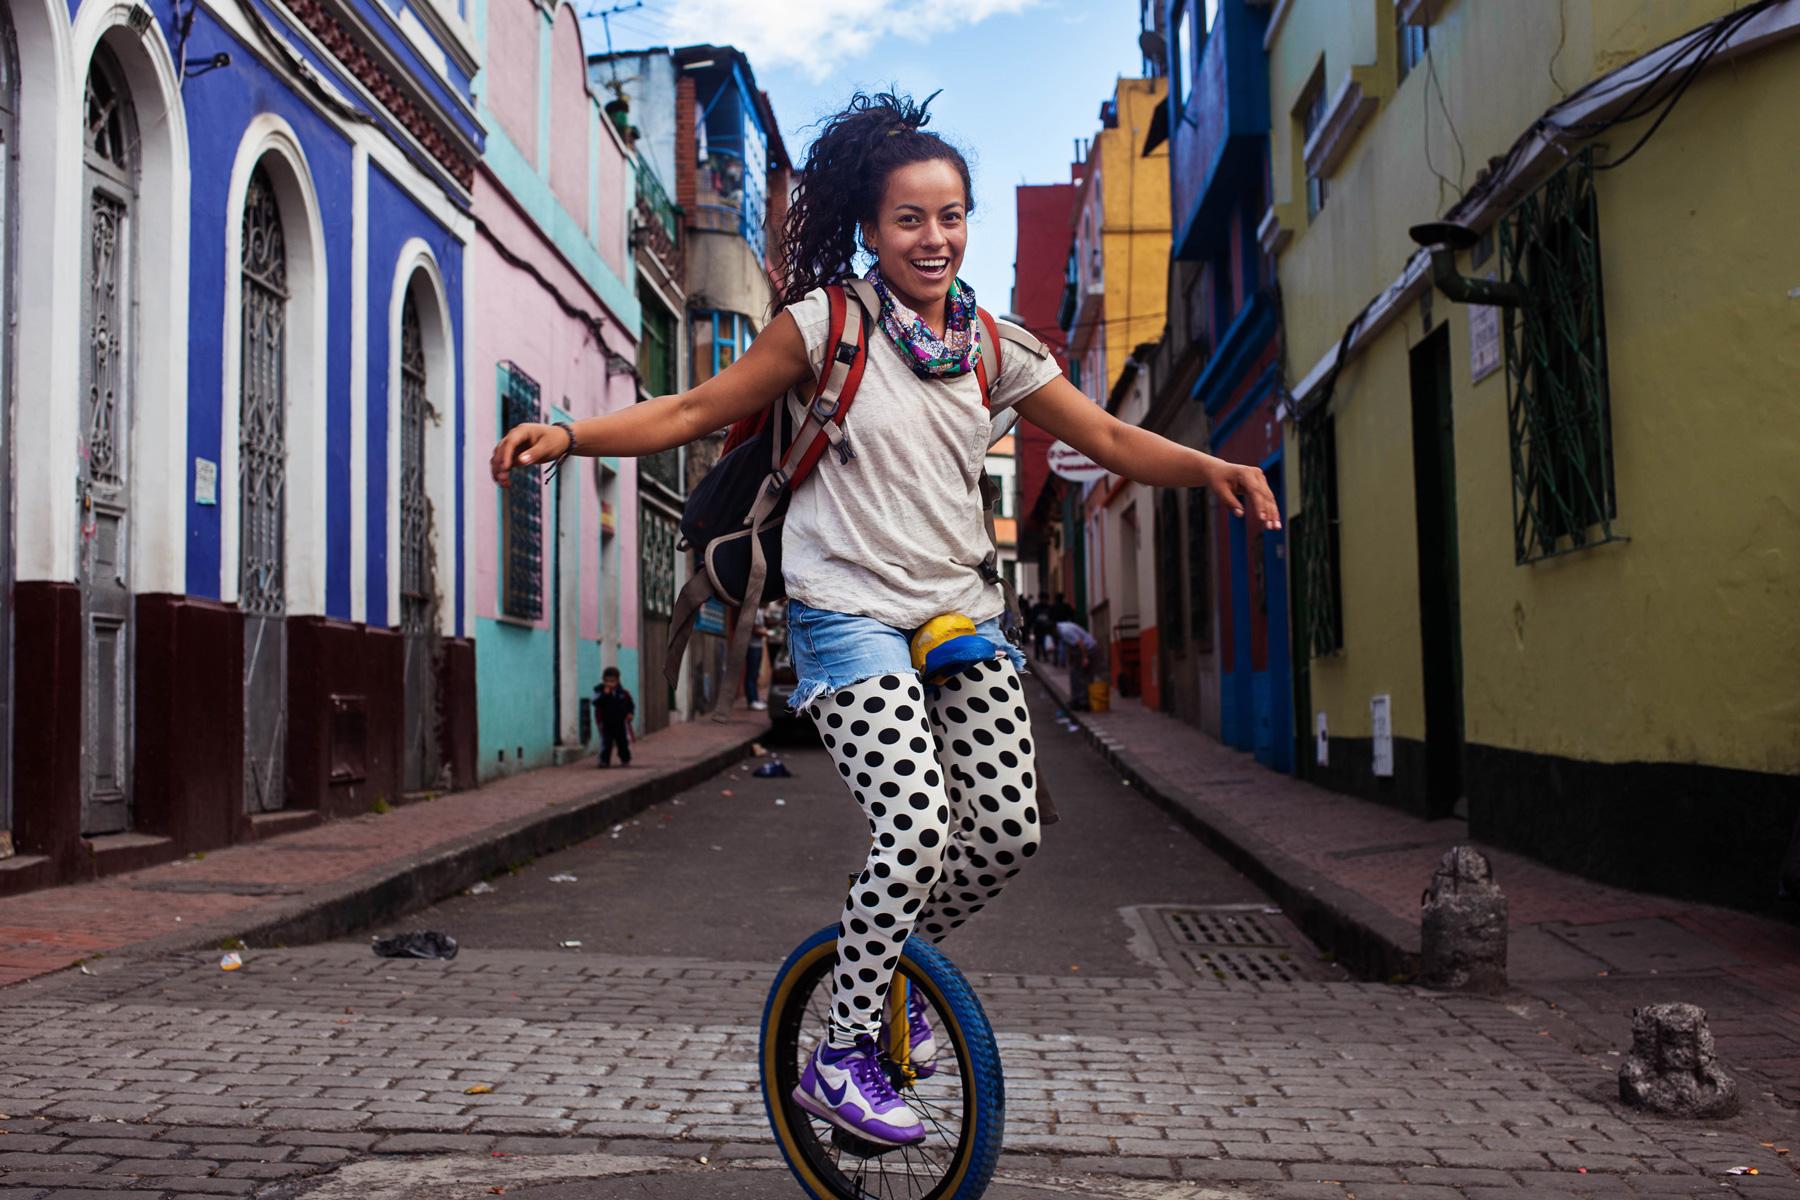 Mihaela-Noroc-Atlas-of-Beauty-Bogota-Colombia